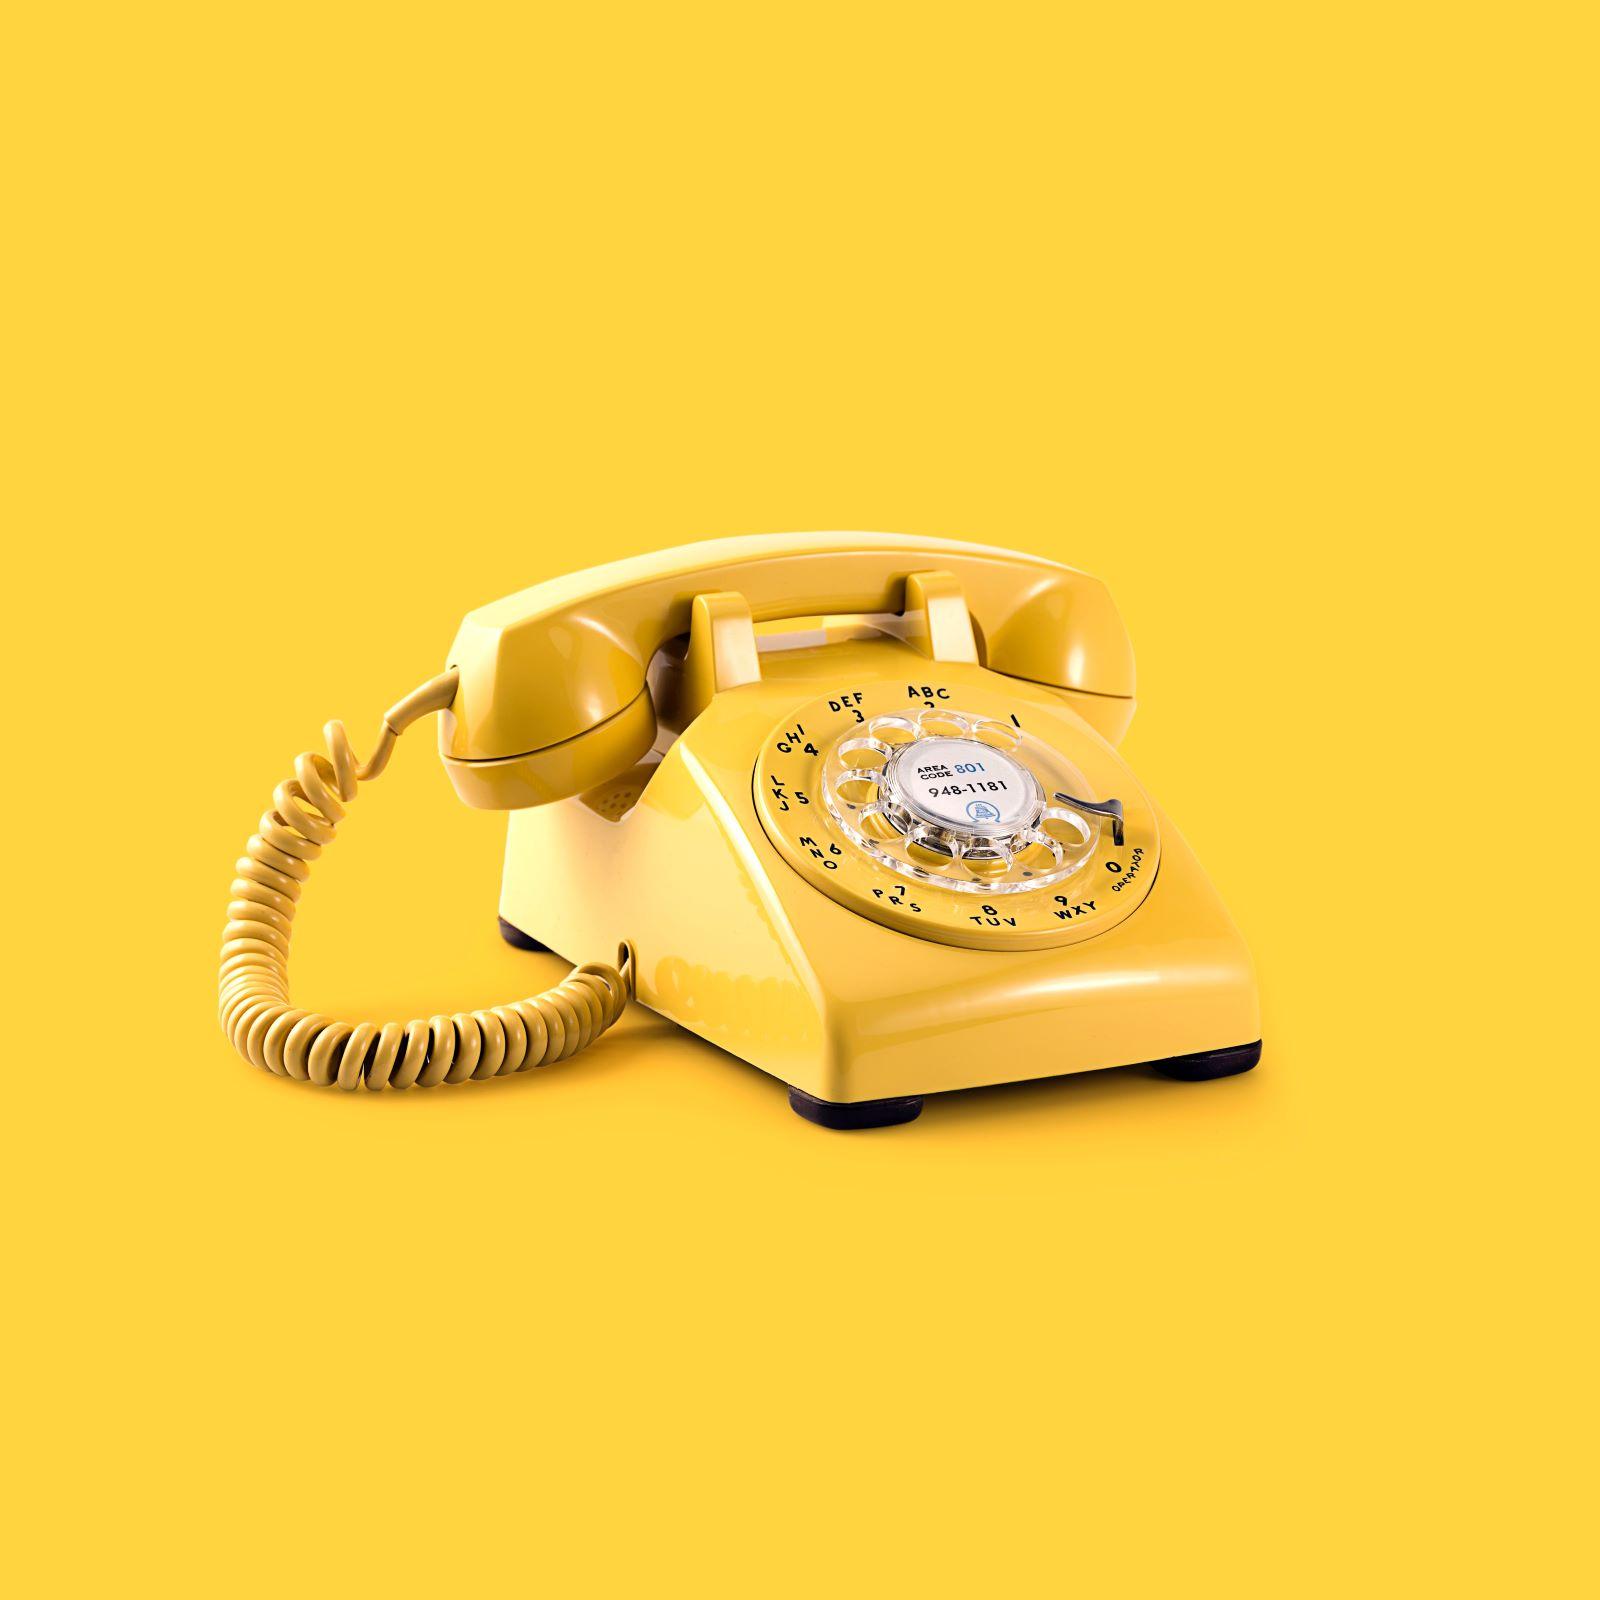 Ouderwetse gele telefoon op gele achtergrond